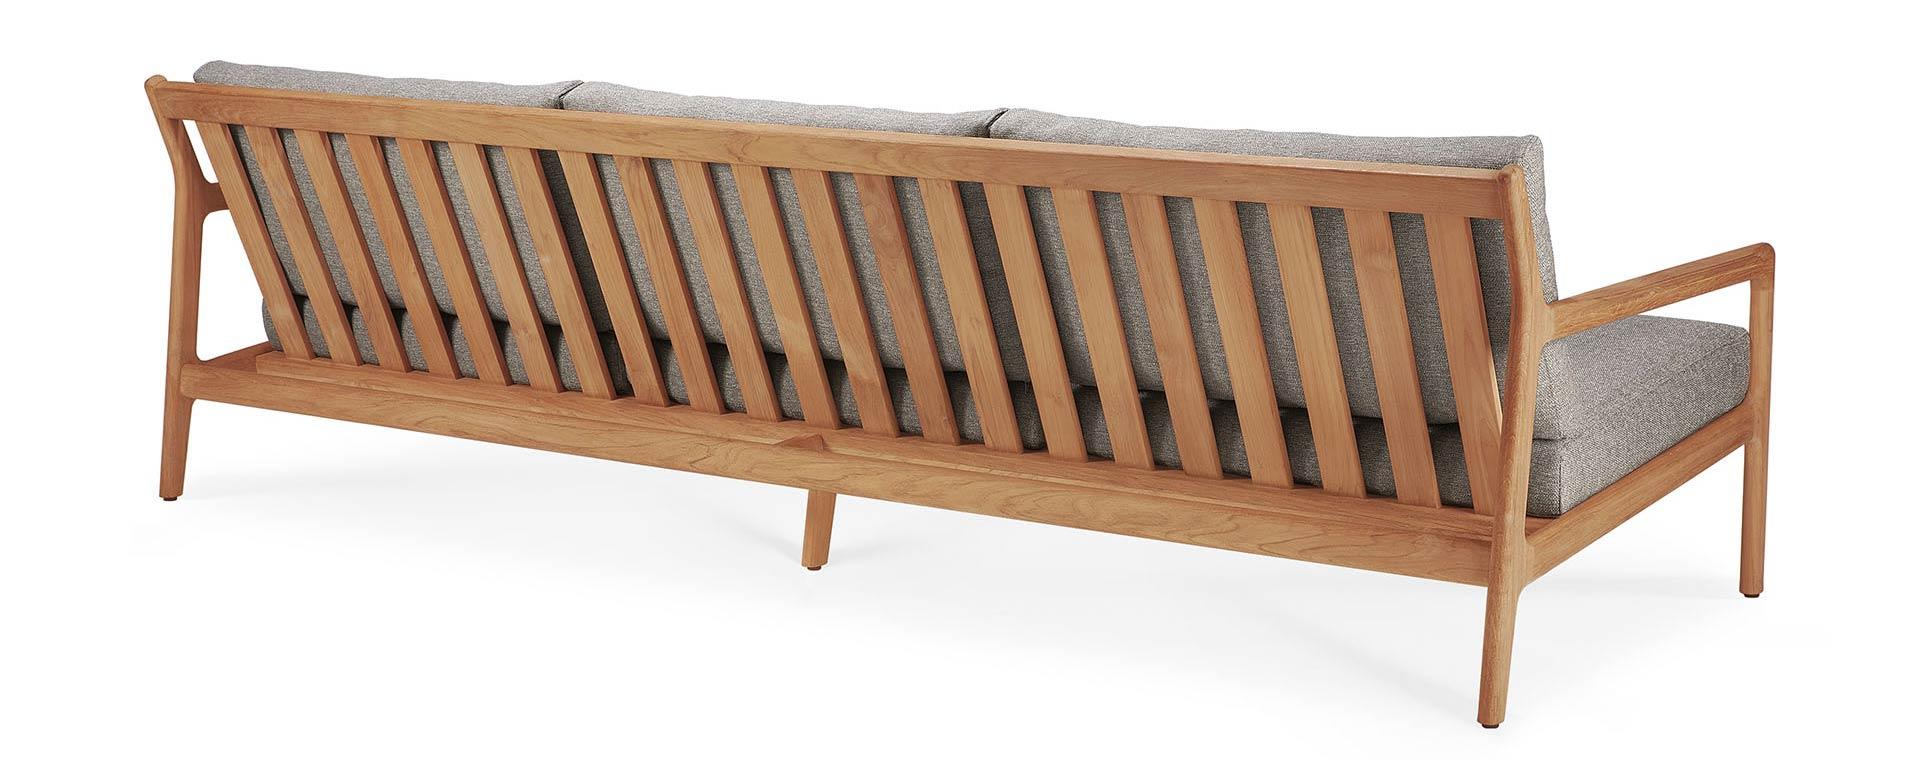 Jack Teak Exterior Furniture by Ethnicraft